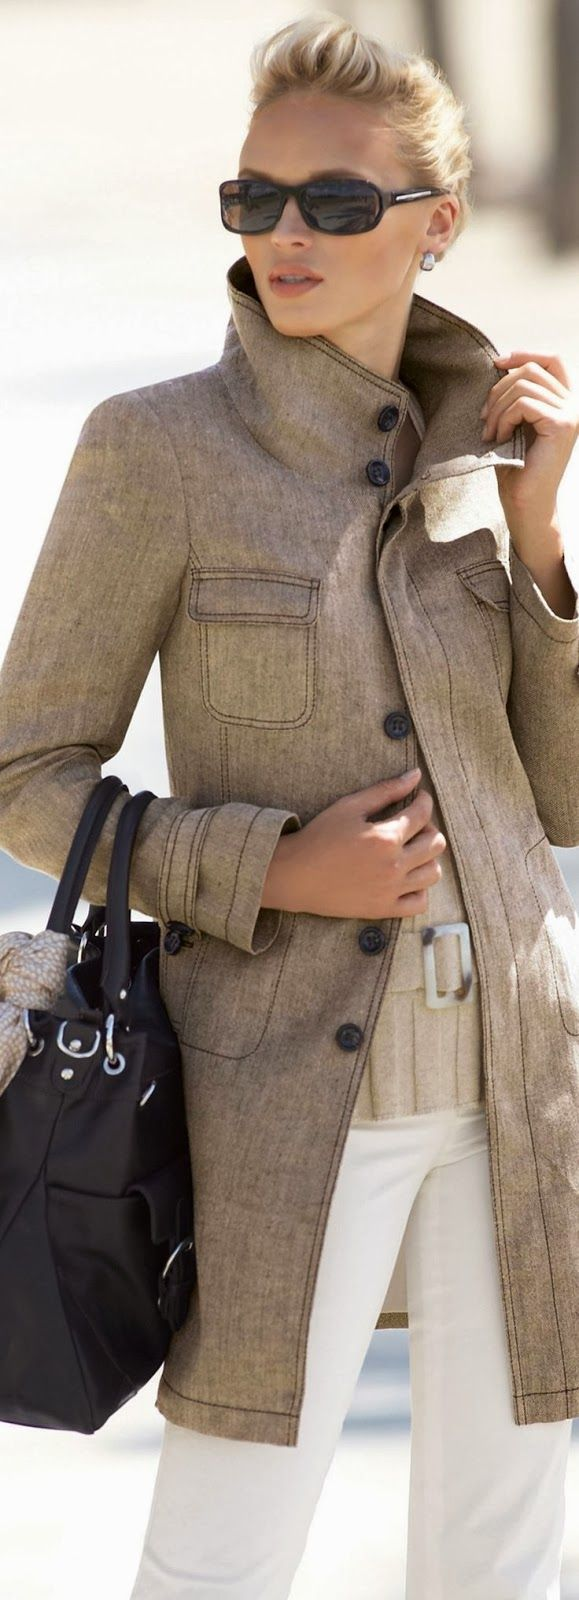 Four Pocket Ladies Blazer Click for more